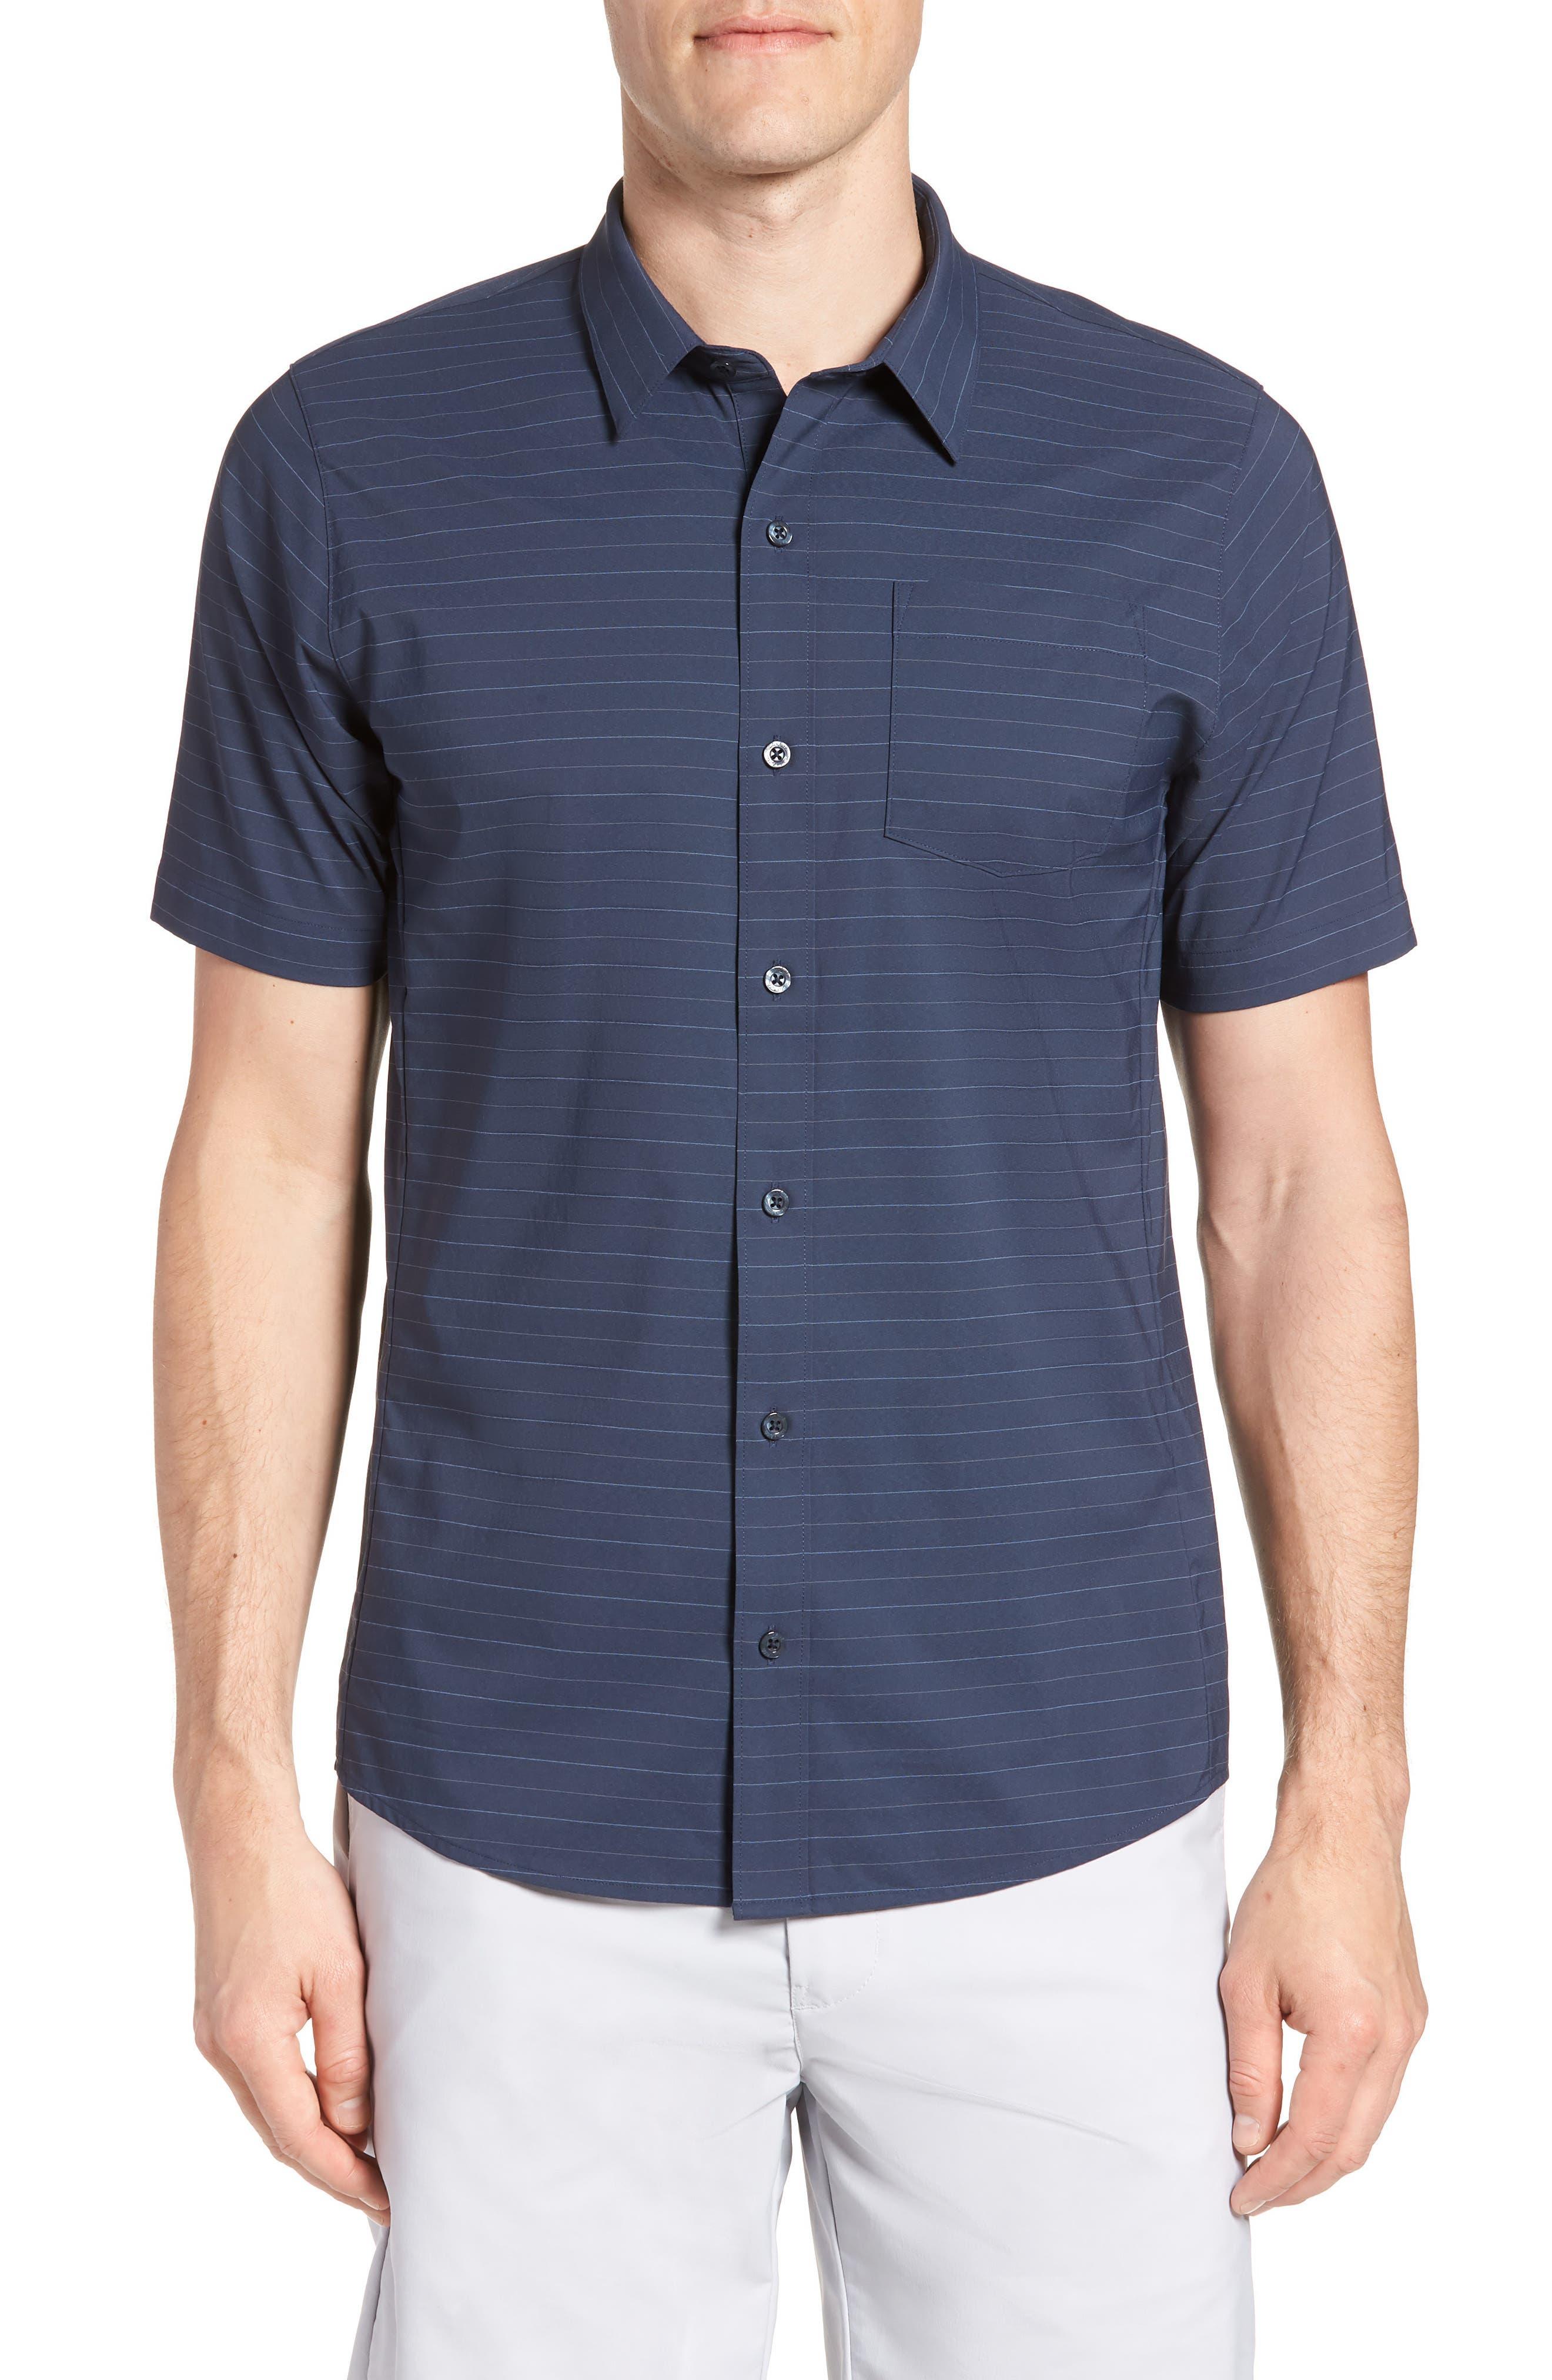 Vagabond Regular Fit Sport Shirt,                         Main,                         color, Heather Blue Nights